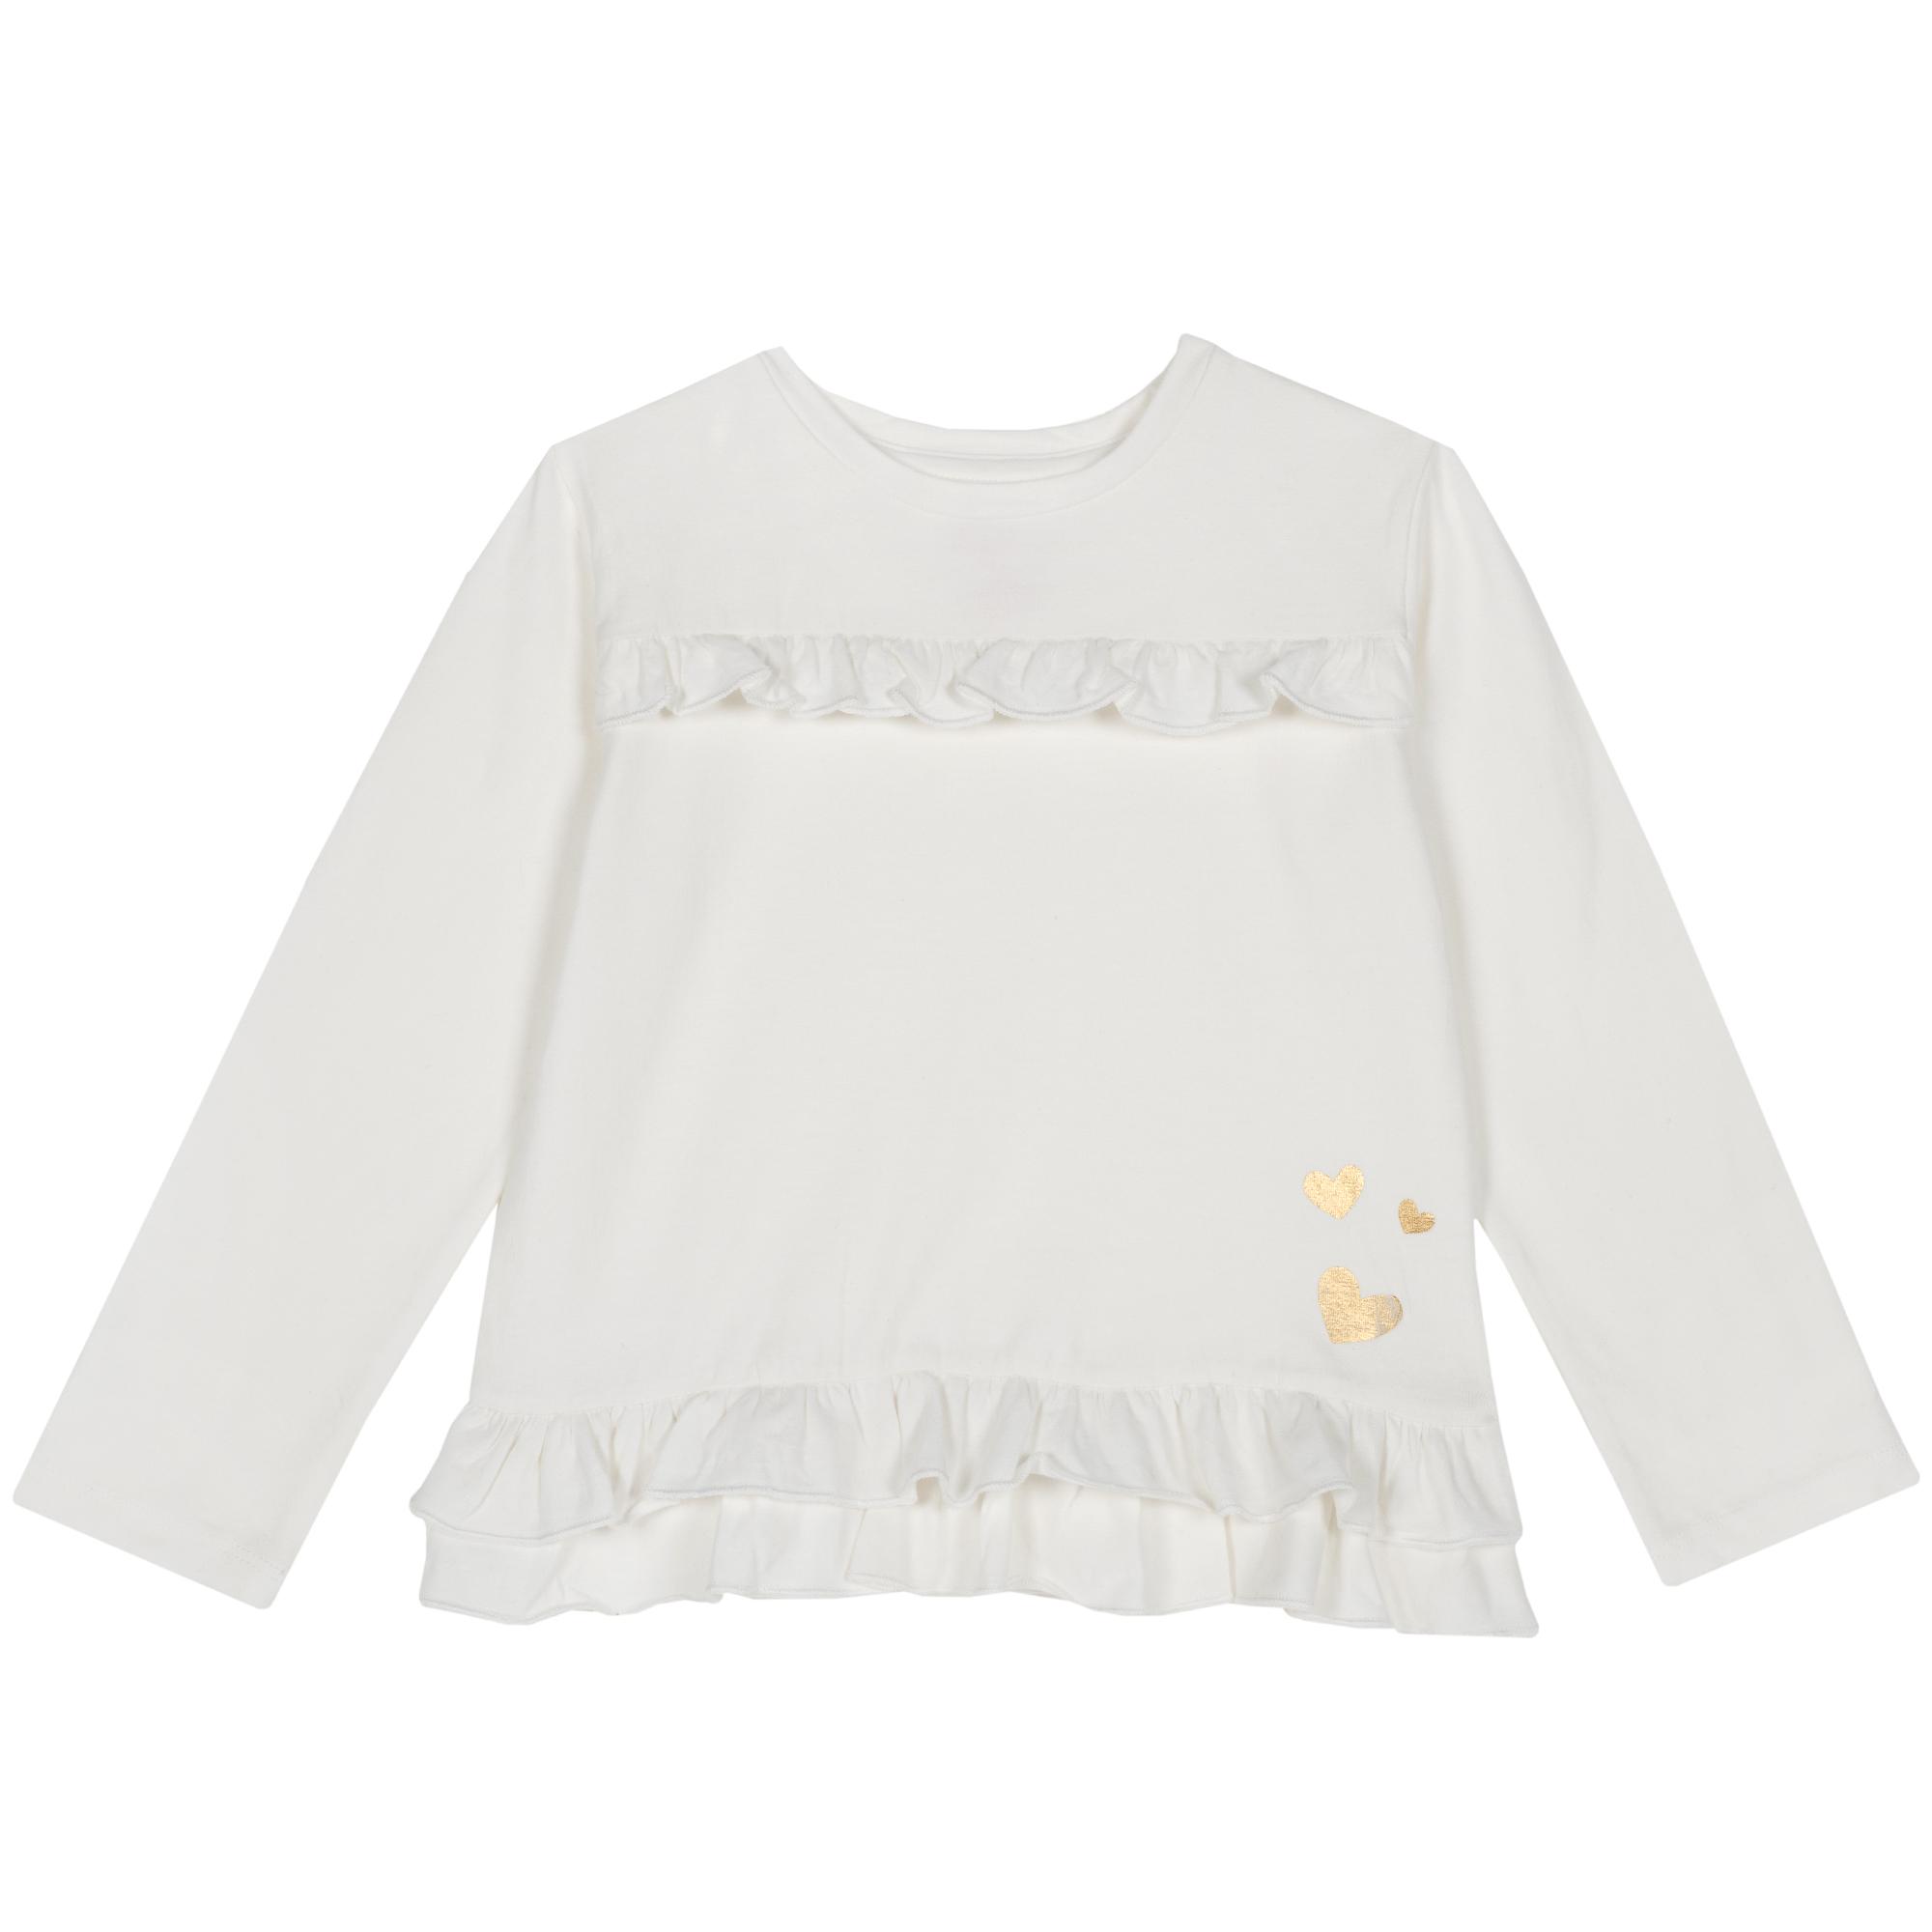 Tricou copii Chicco, alb, 06533